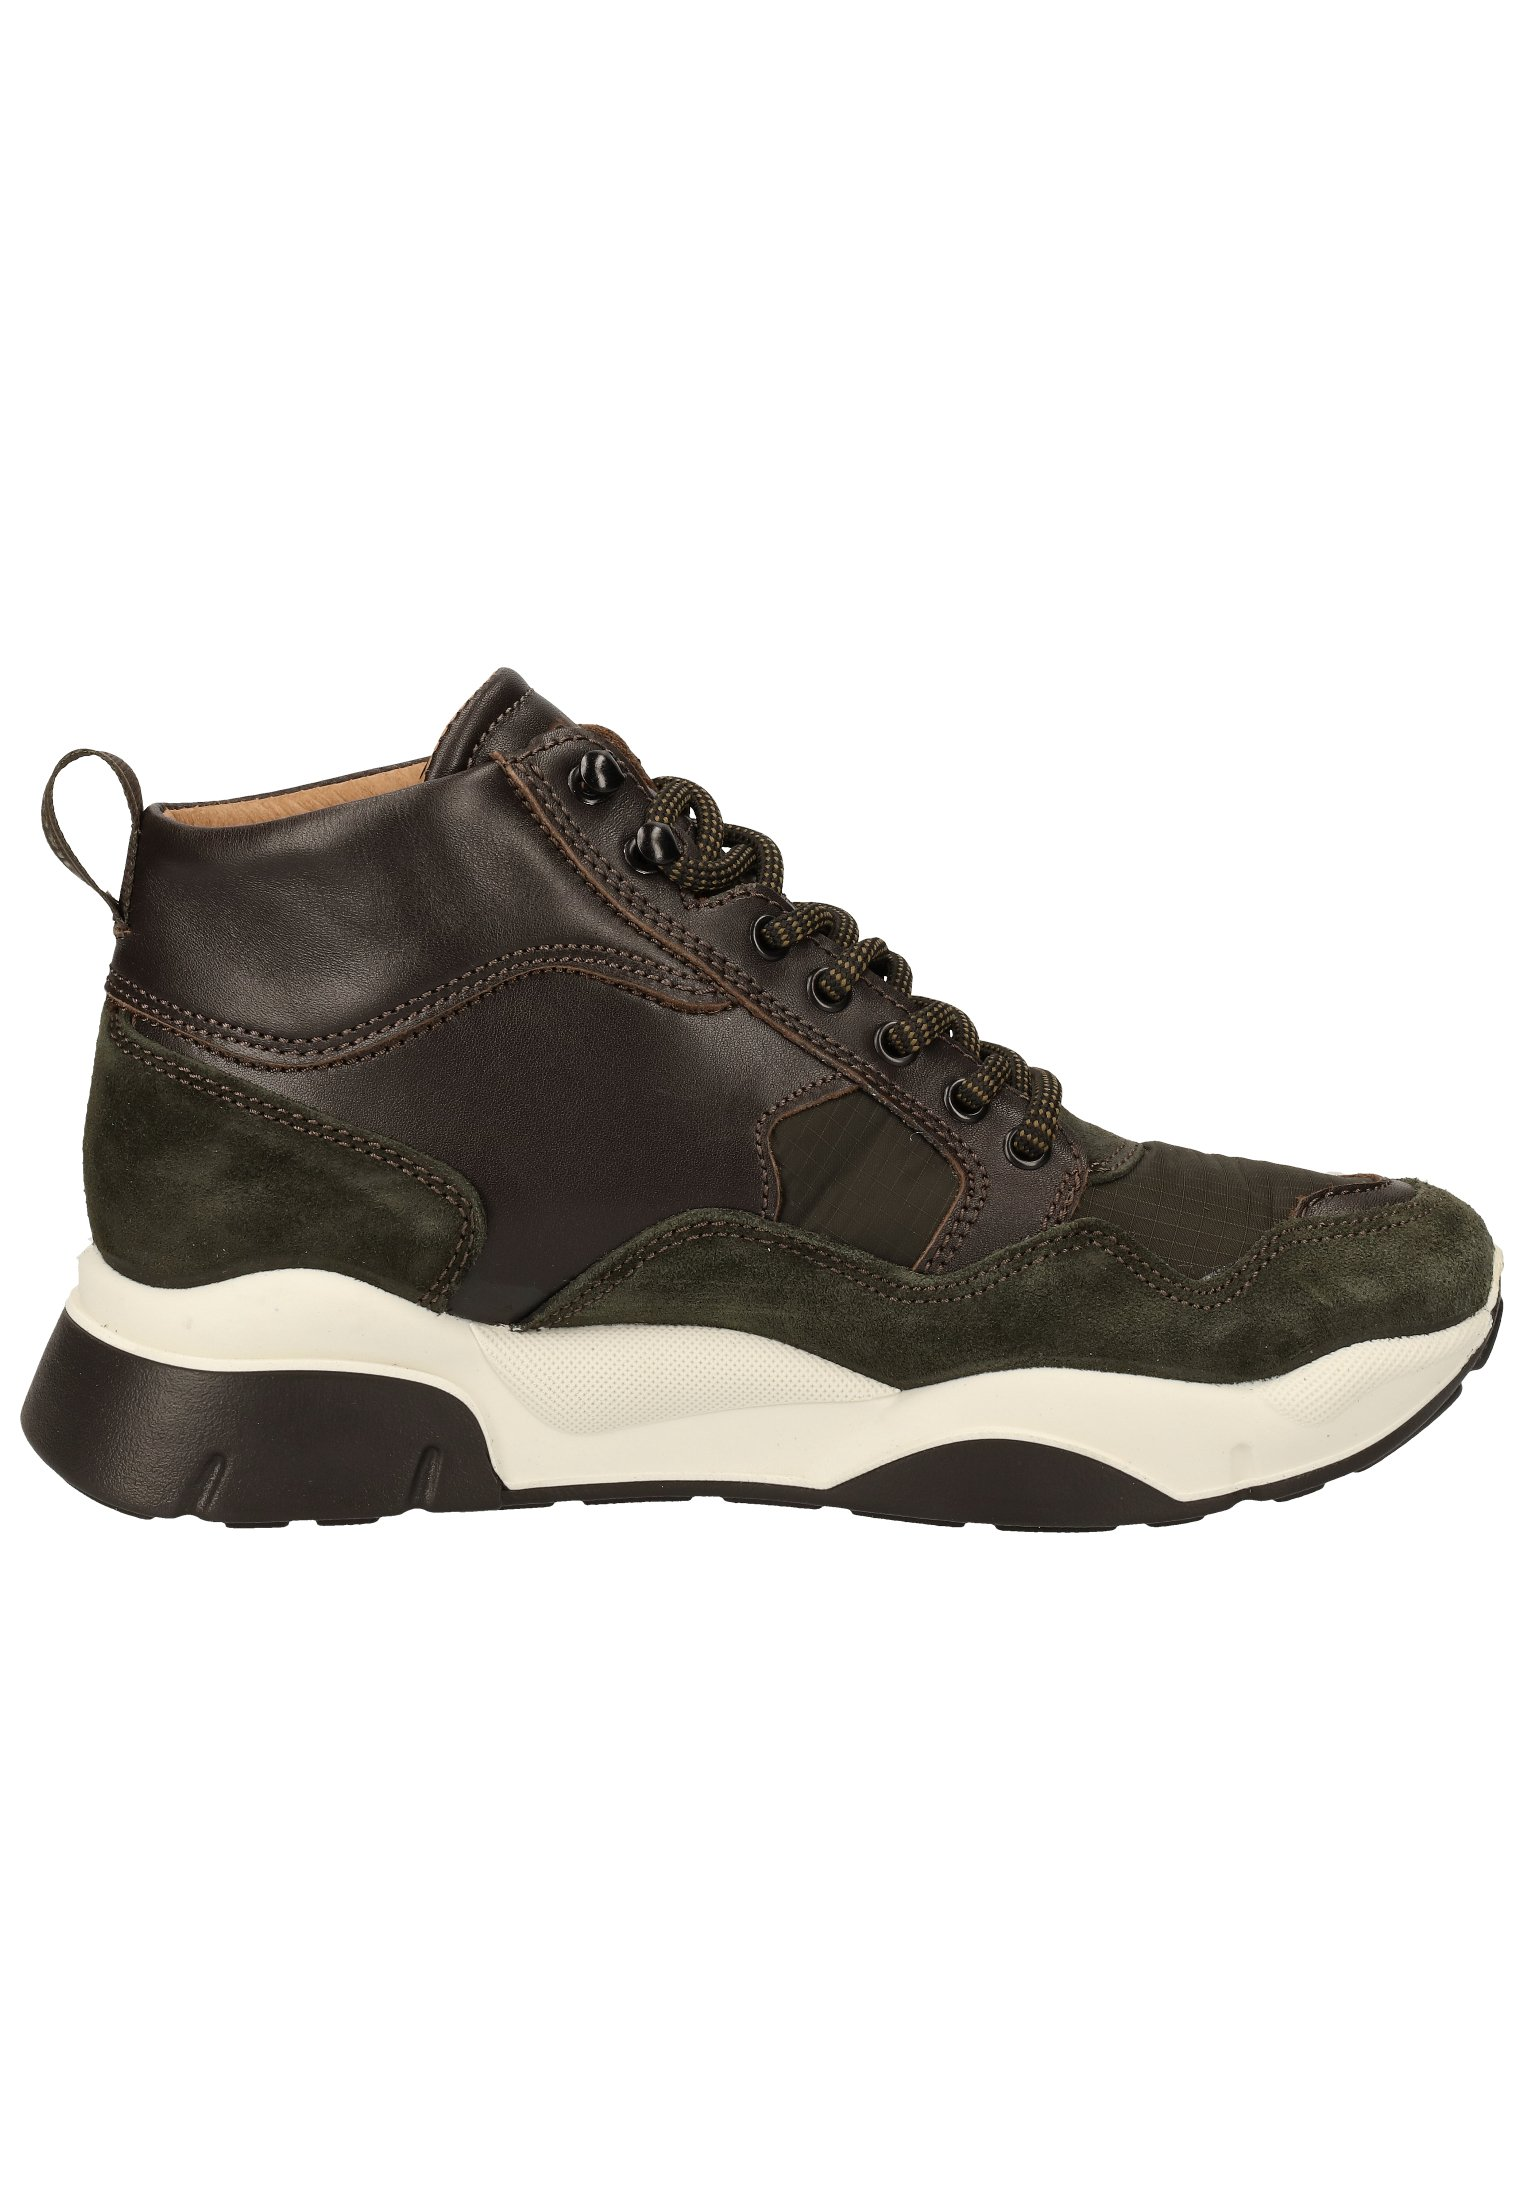 IGICO Sneaker high - bosco/schwarz - Herrenschuhe ptXGP